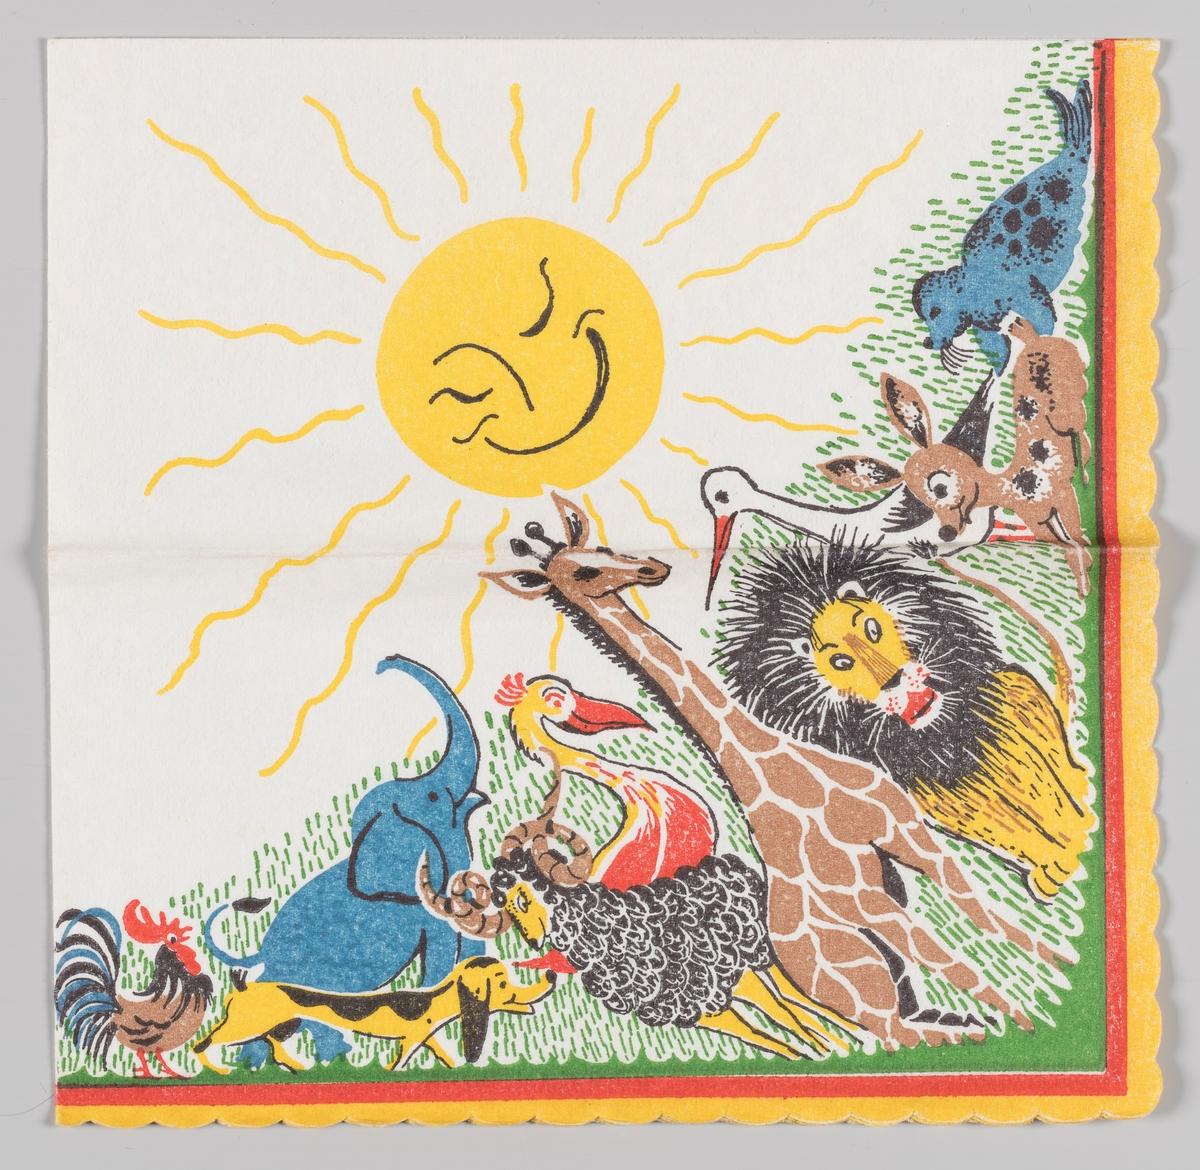 En smilende sol kigger ned på mange dyr: en hane, en elefant, en hund, en geit, en pelikan, en sjiraff, en løve, en stork, en hjort og en sel.